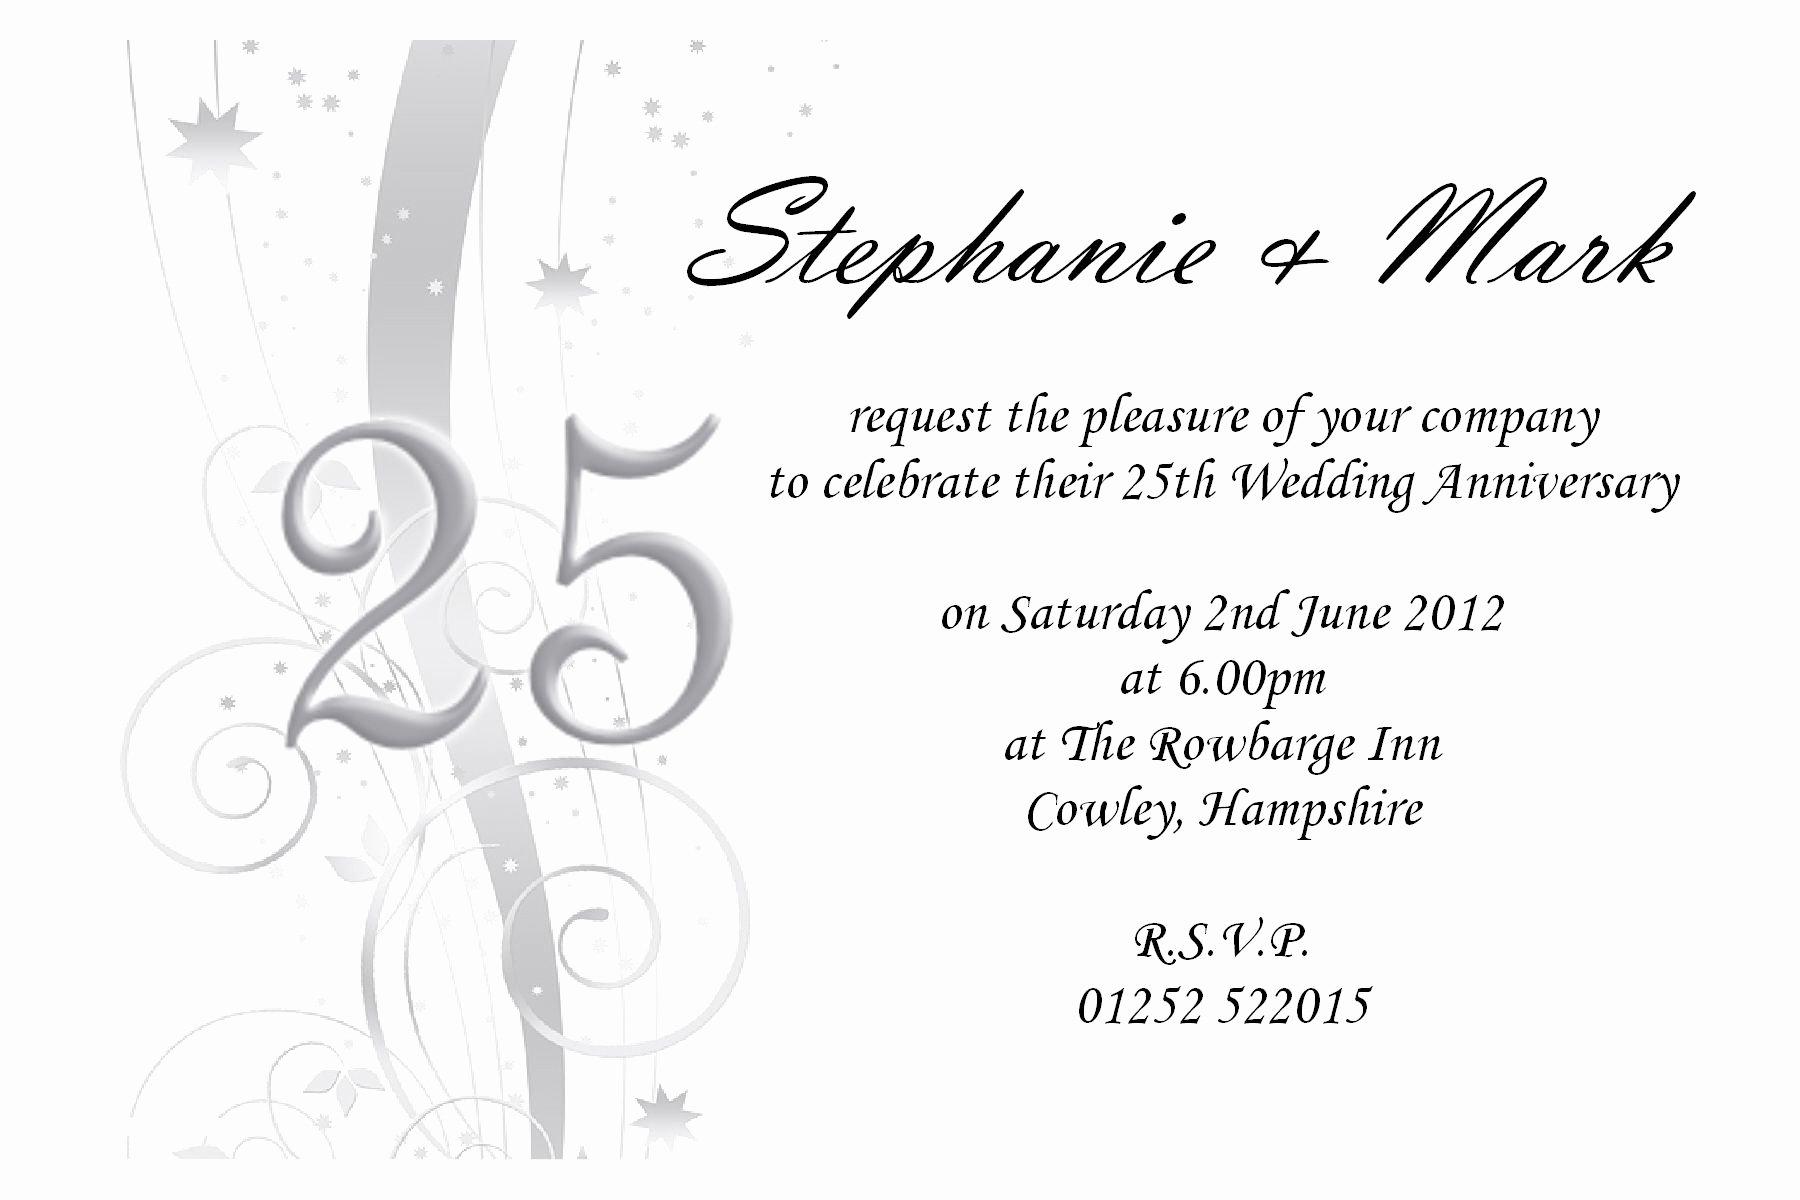 Wedding Anniversary Invite Template Luxury 25th Wedding Anniversary Invites 25th Wedding